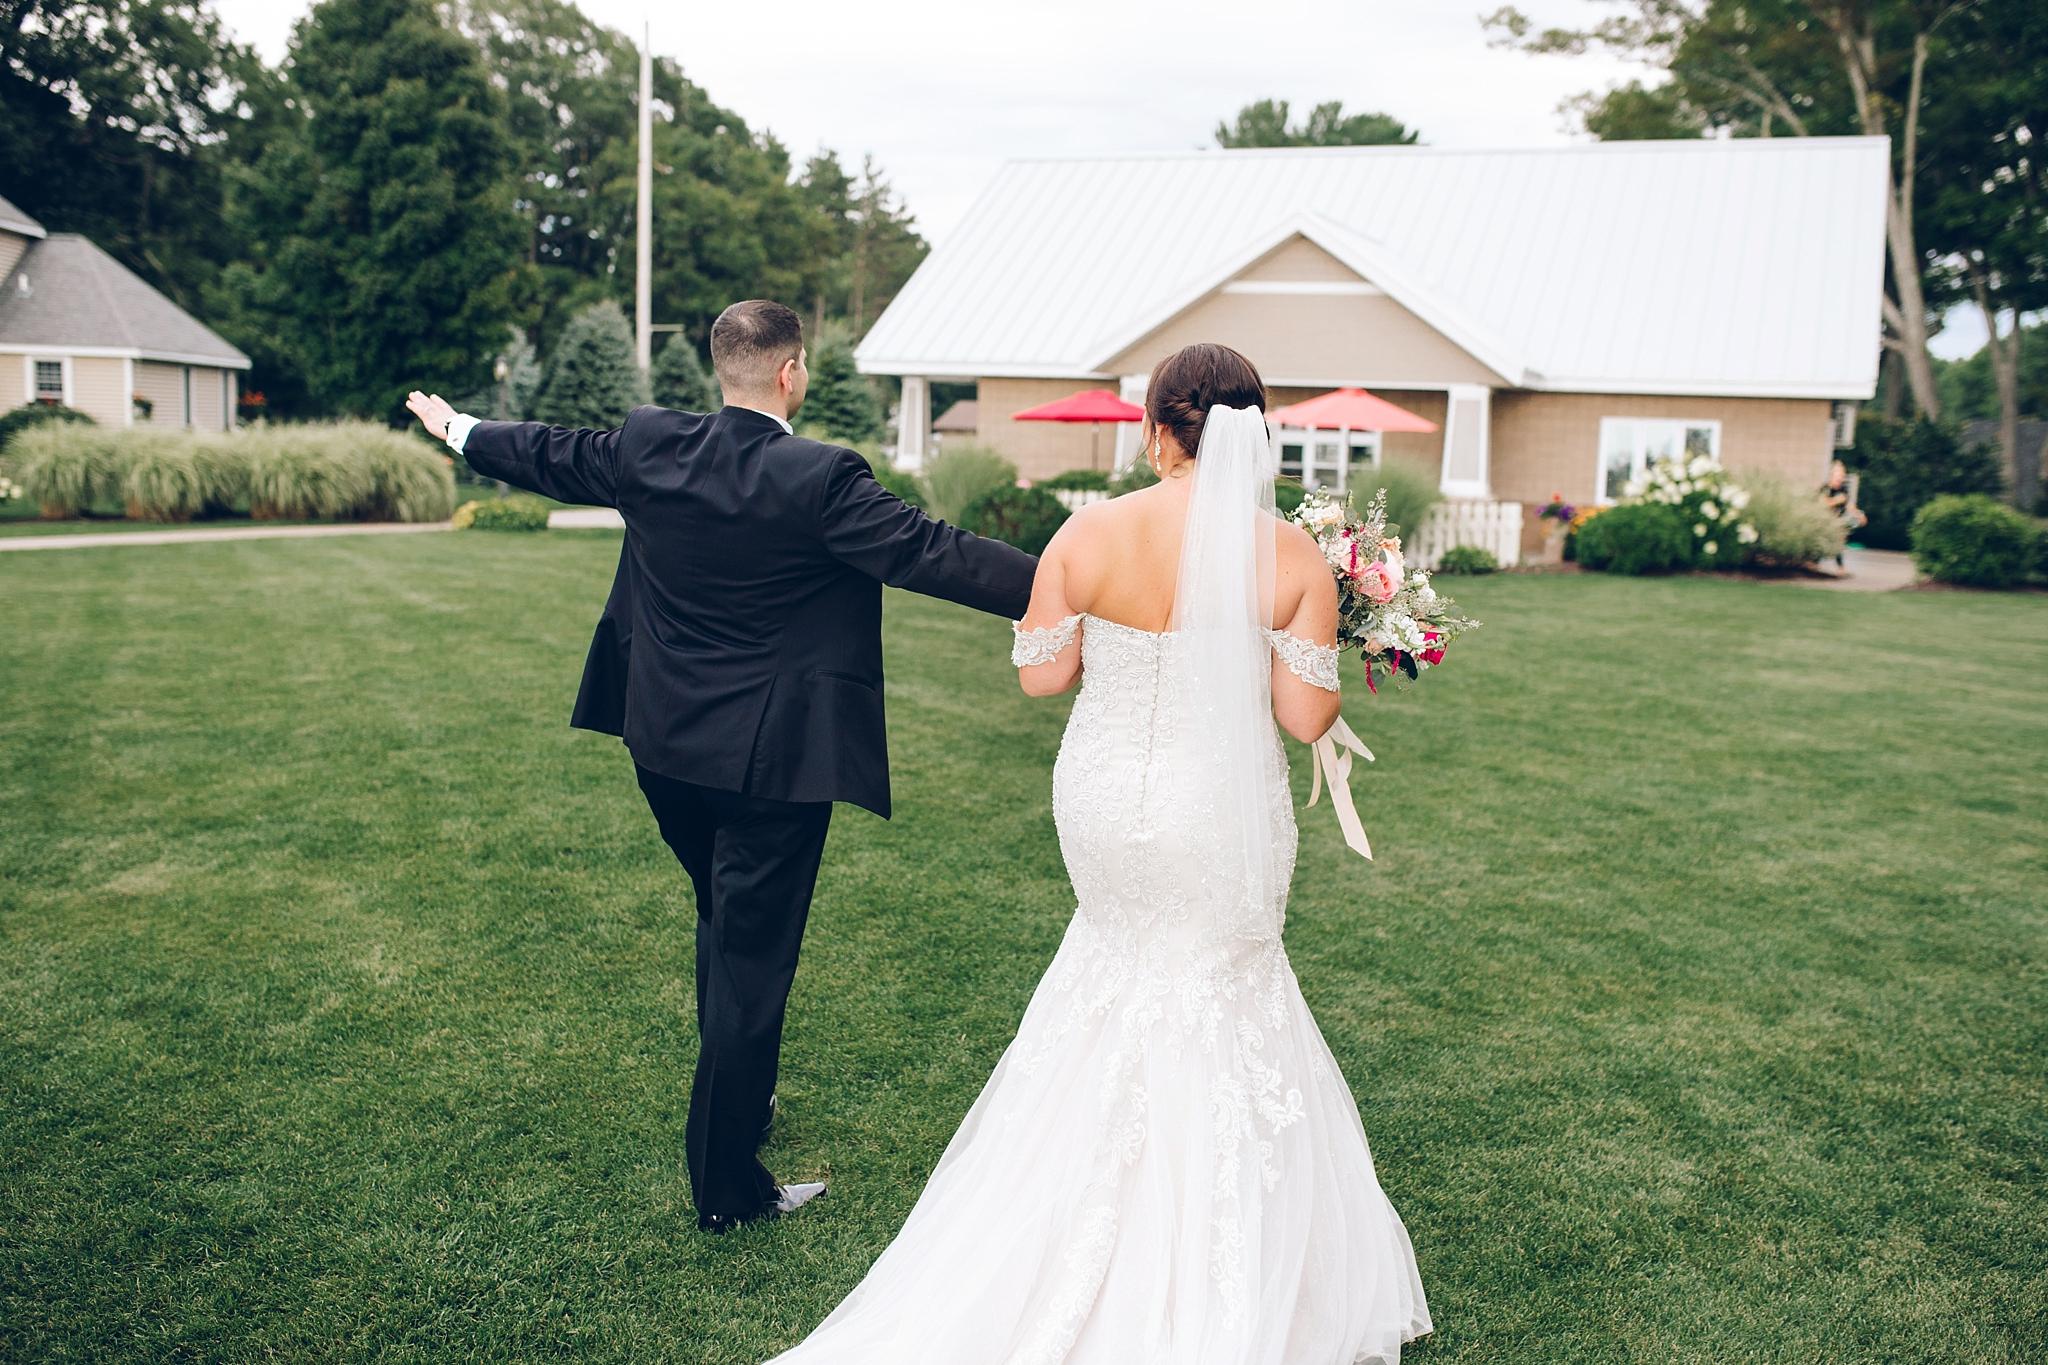 baker-lofts-holland-michigan-wedding-photographer_0362.jpg